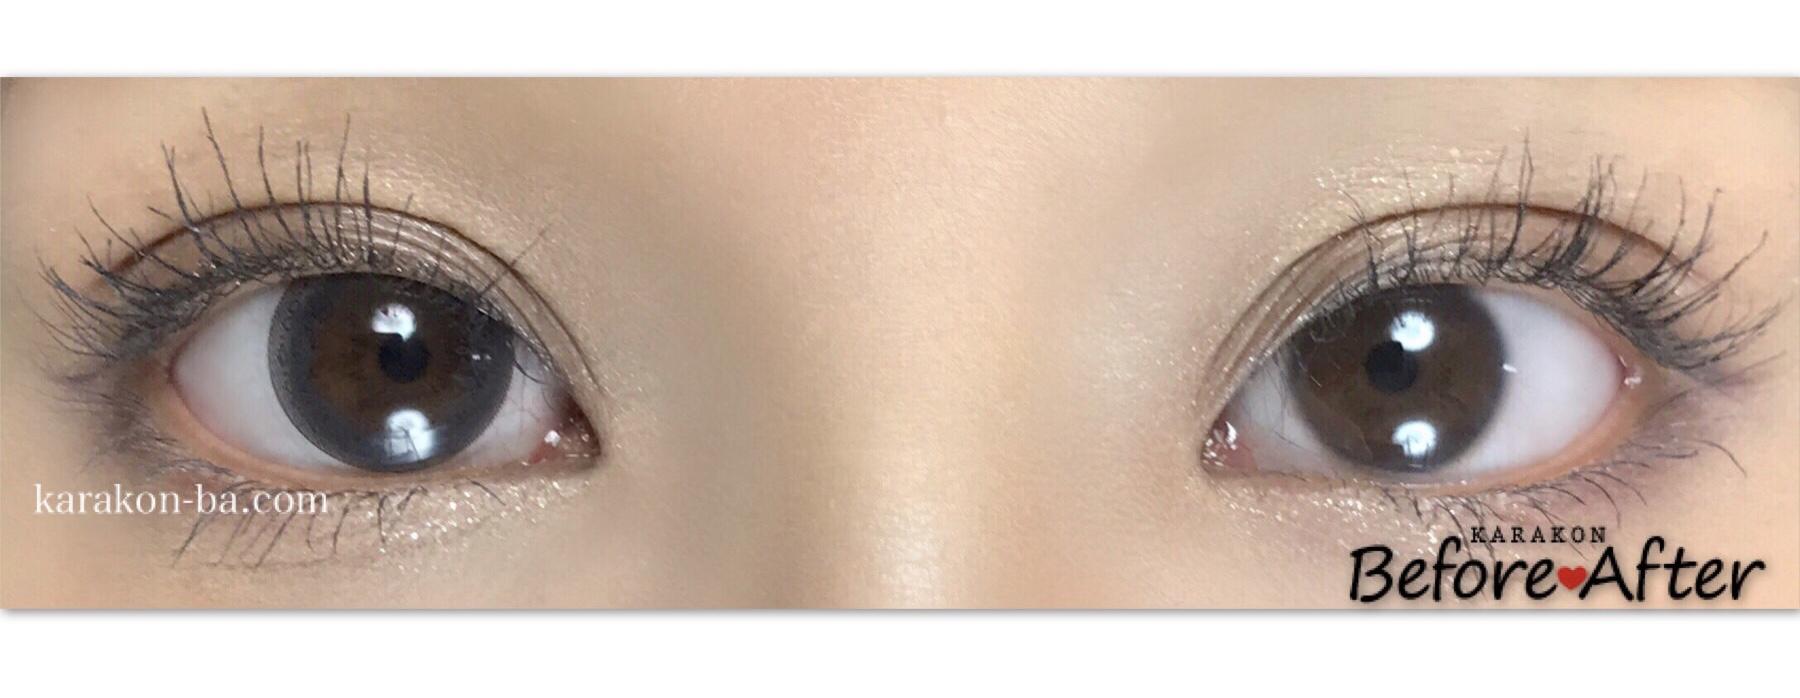 Eye Coffret 1day UV(アイコフレワンデー)グレイスメイクのカラコン装着画像/両目で比較レポ